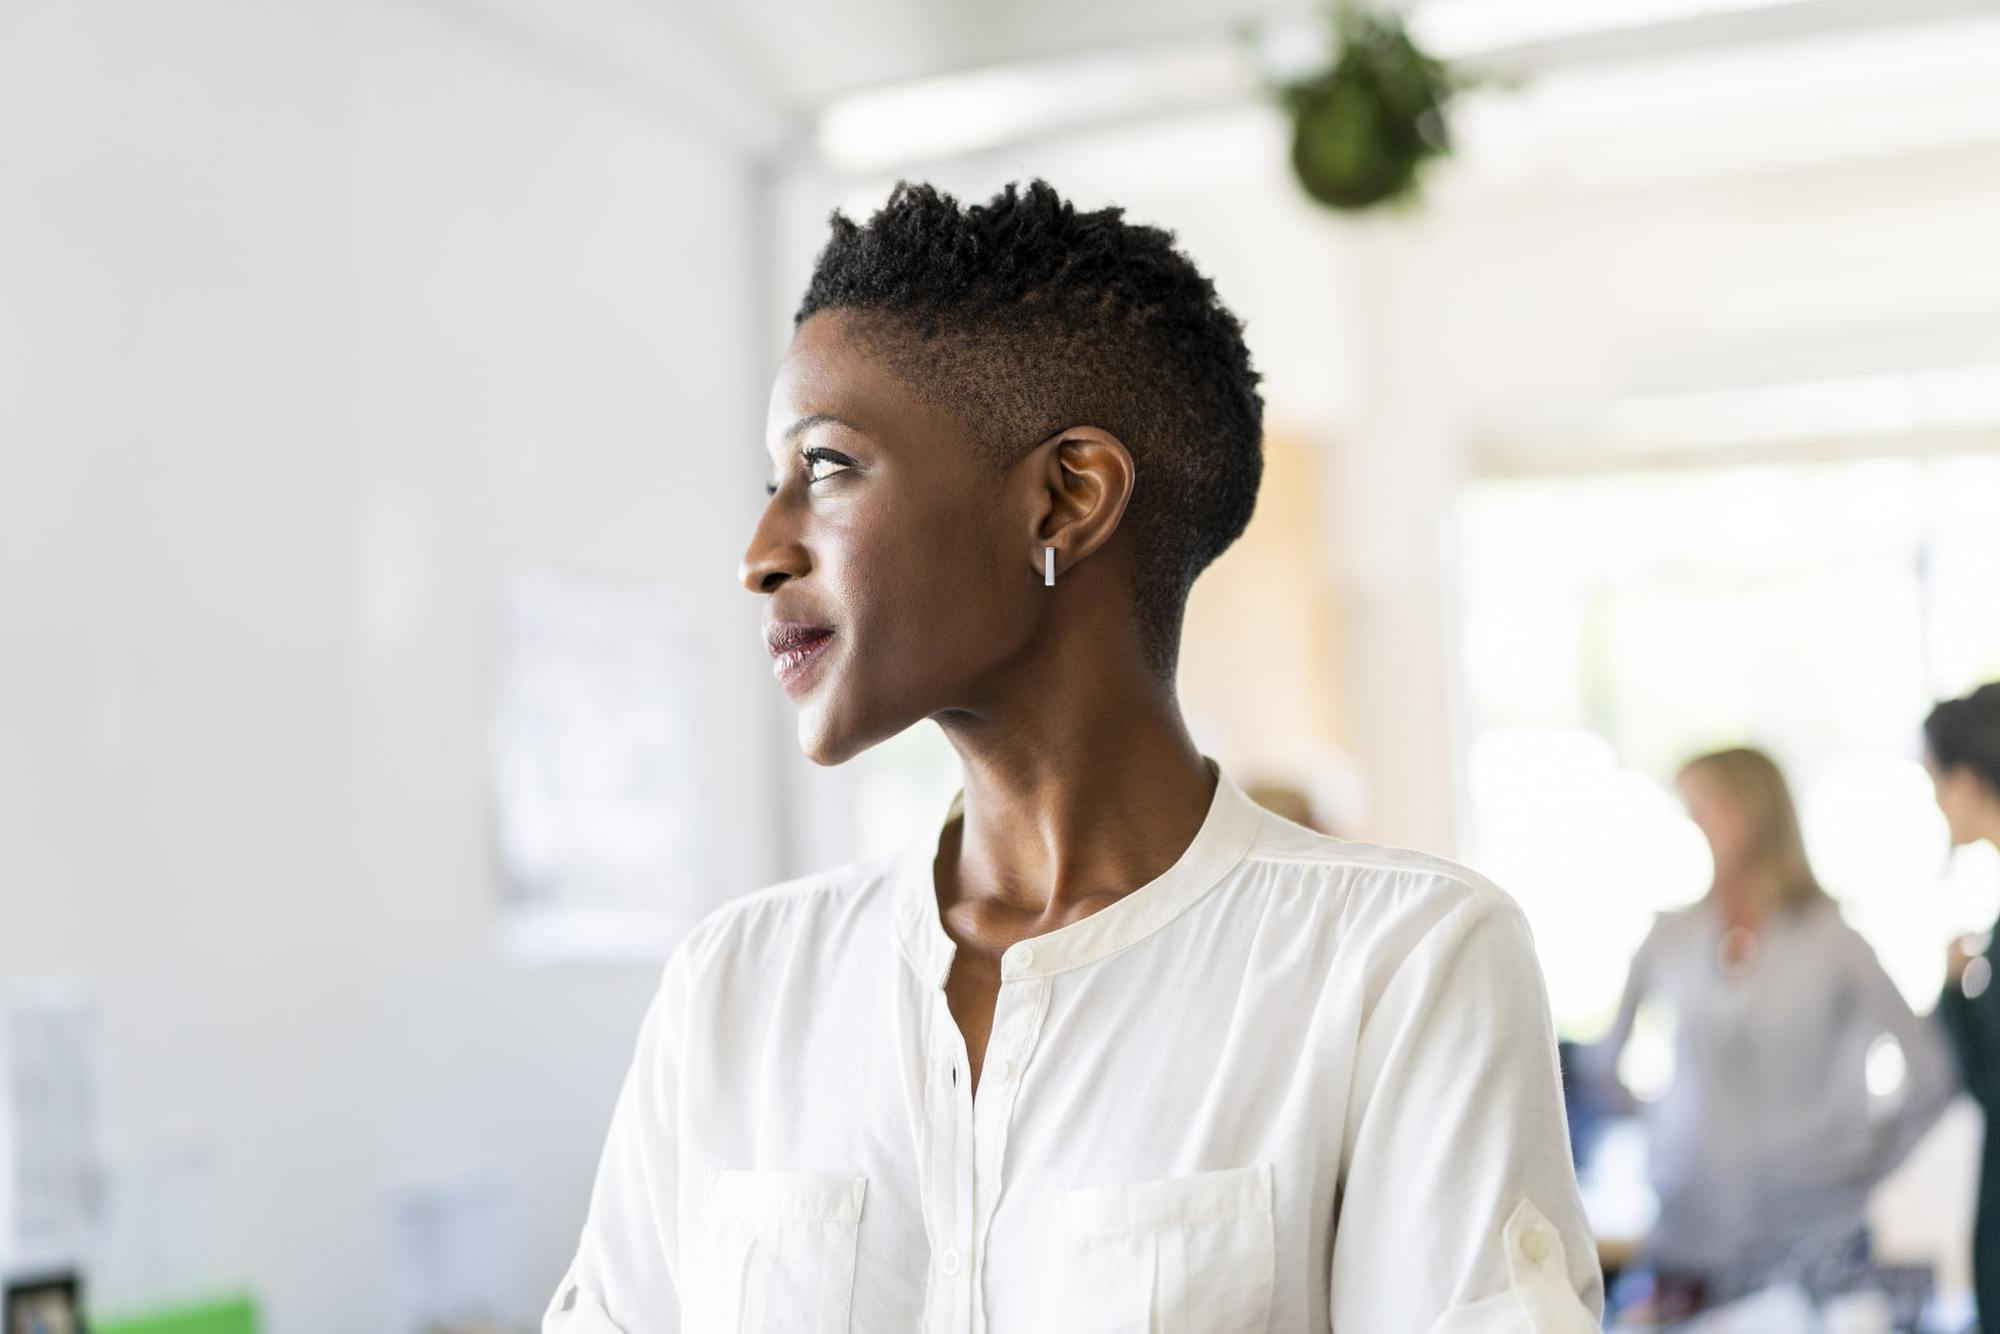 51 Stylish Short Hairstyles For Black Women Short Black Hair